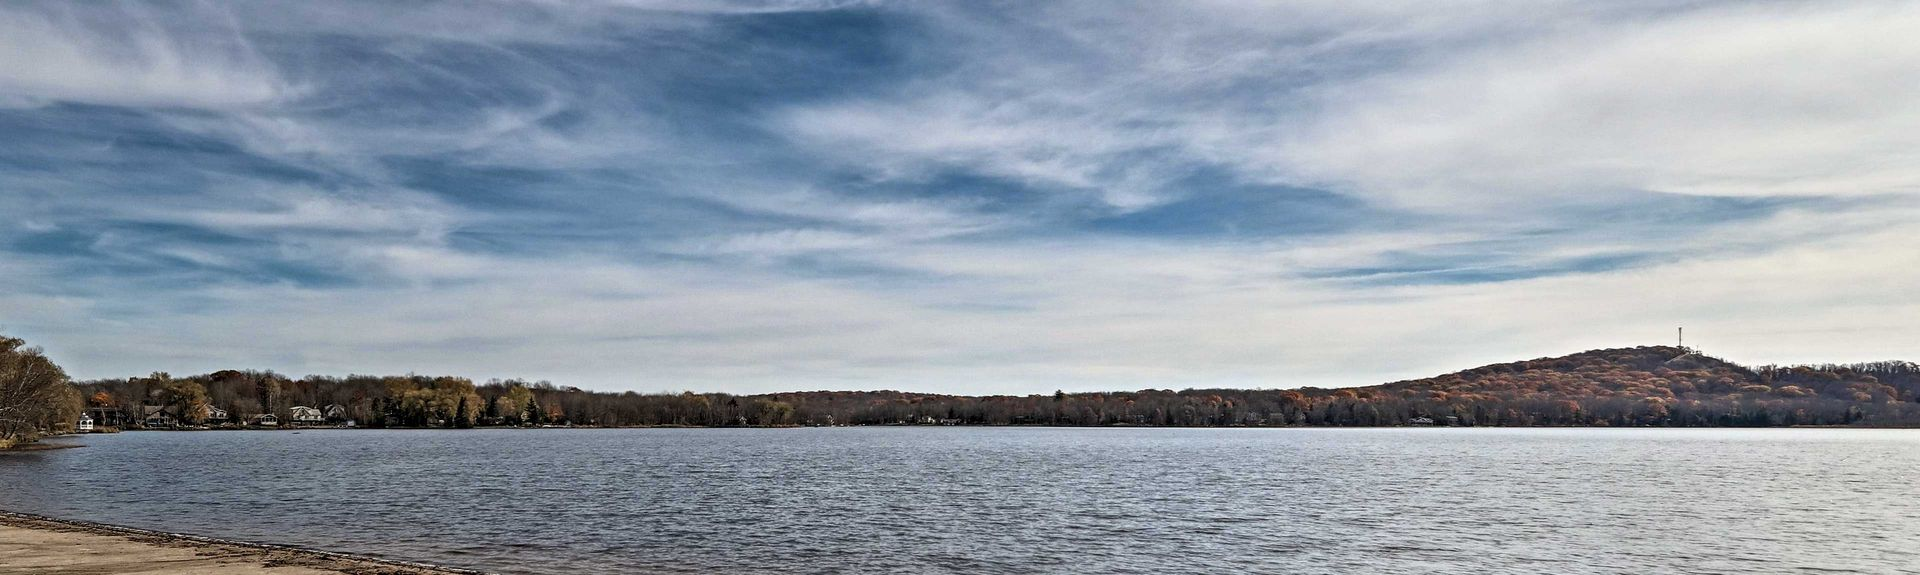 Arrowhead Lake, Pocono Lake, Pennsylvania, United States of America